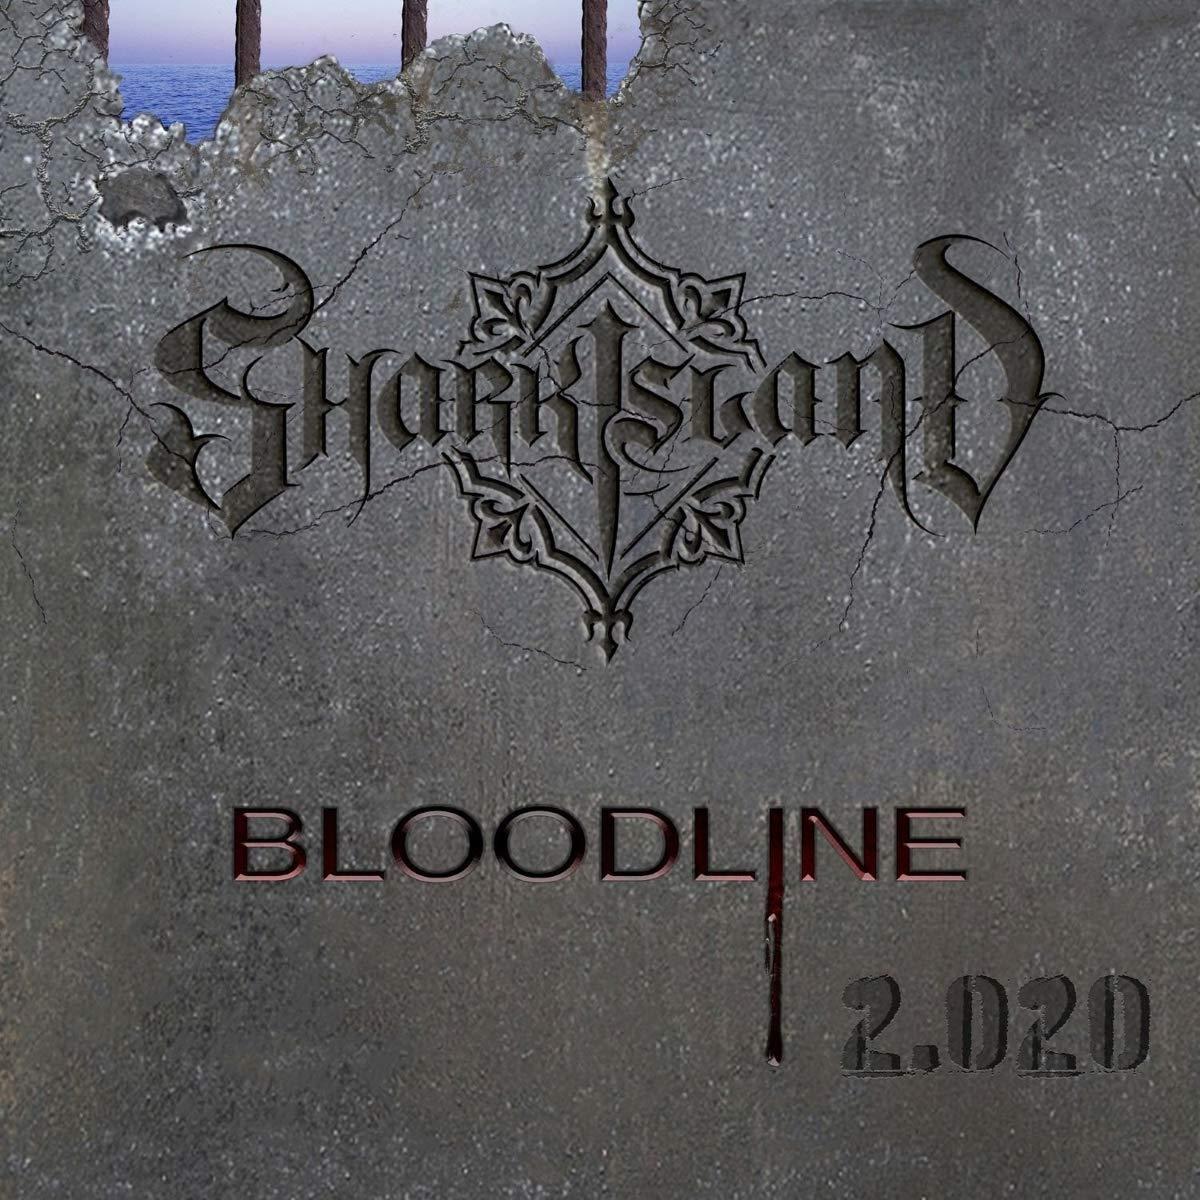 Shark Island - Bloodline 2.020 (2020) [FLAC] Download